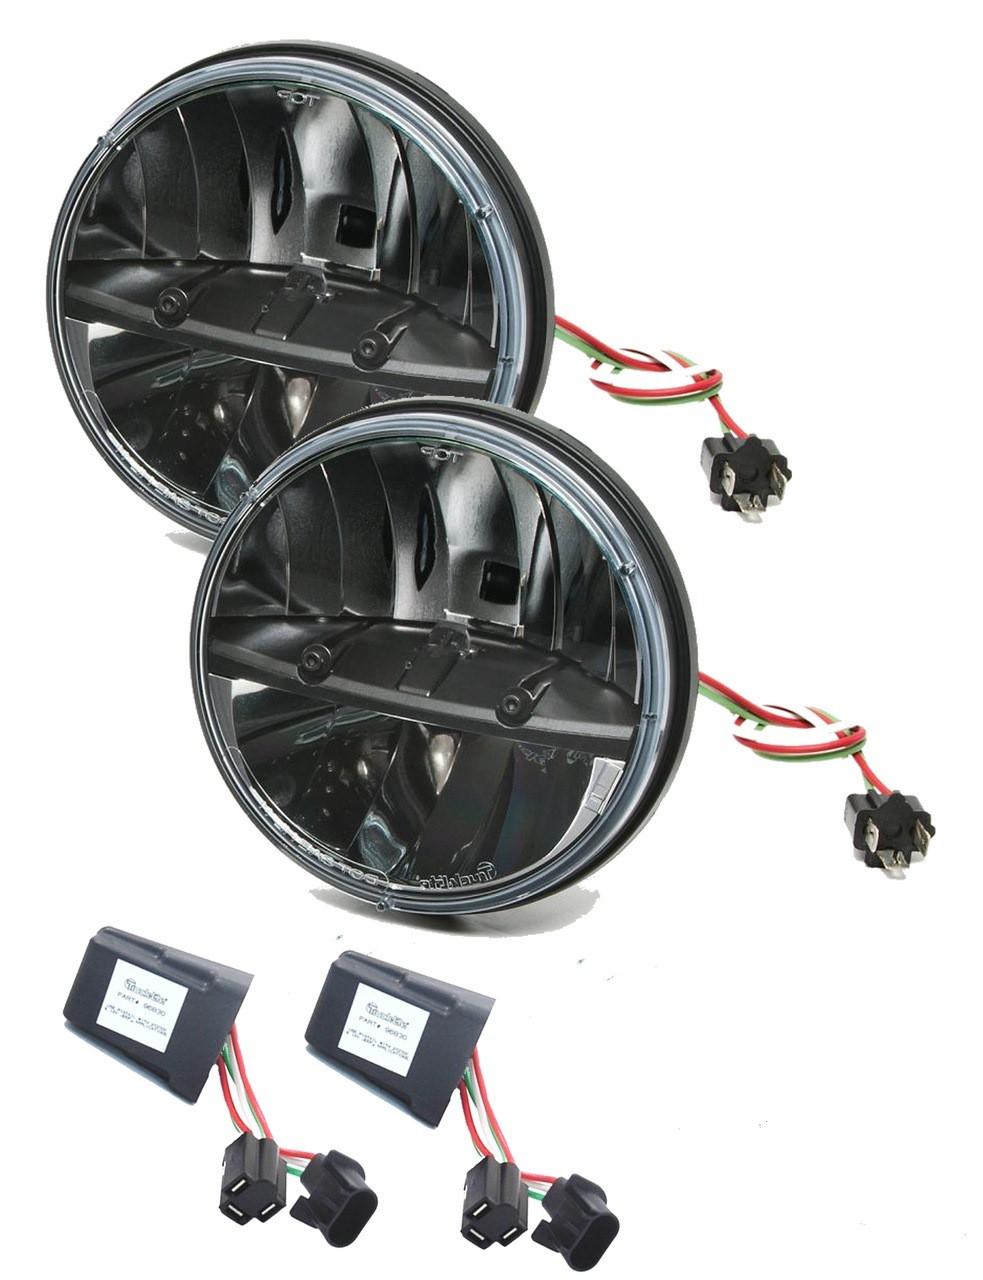 medium resolution of truck lite 27270c jeep jk kit 7 round led headlight pair anti flicker harness